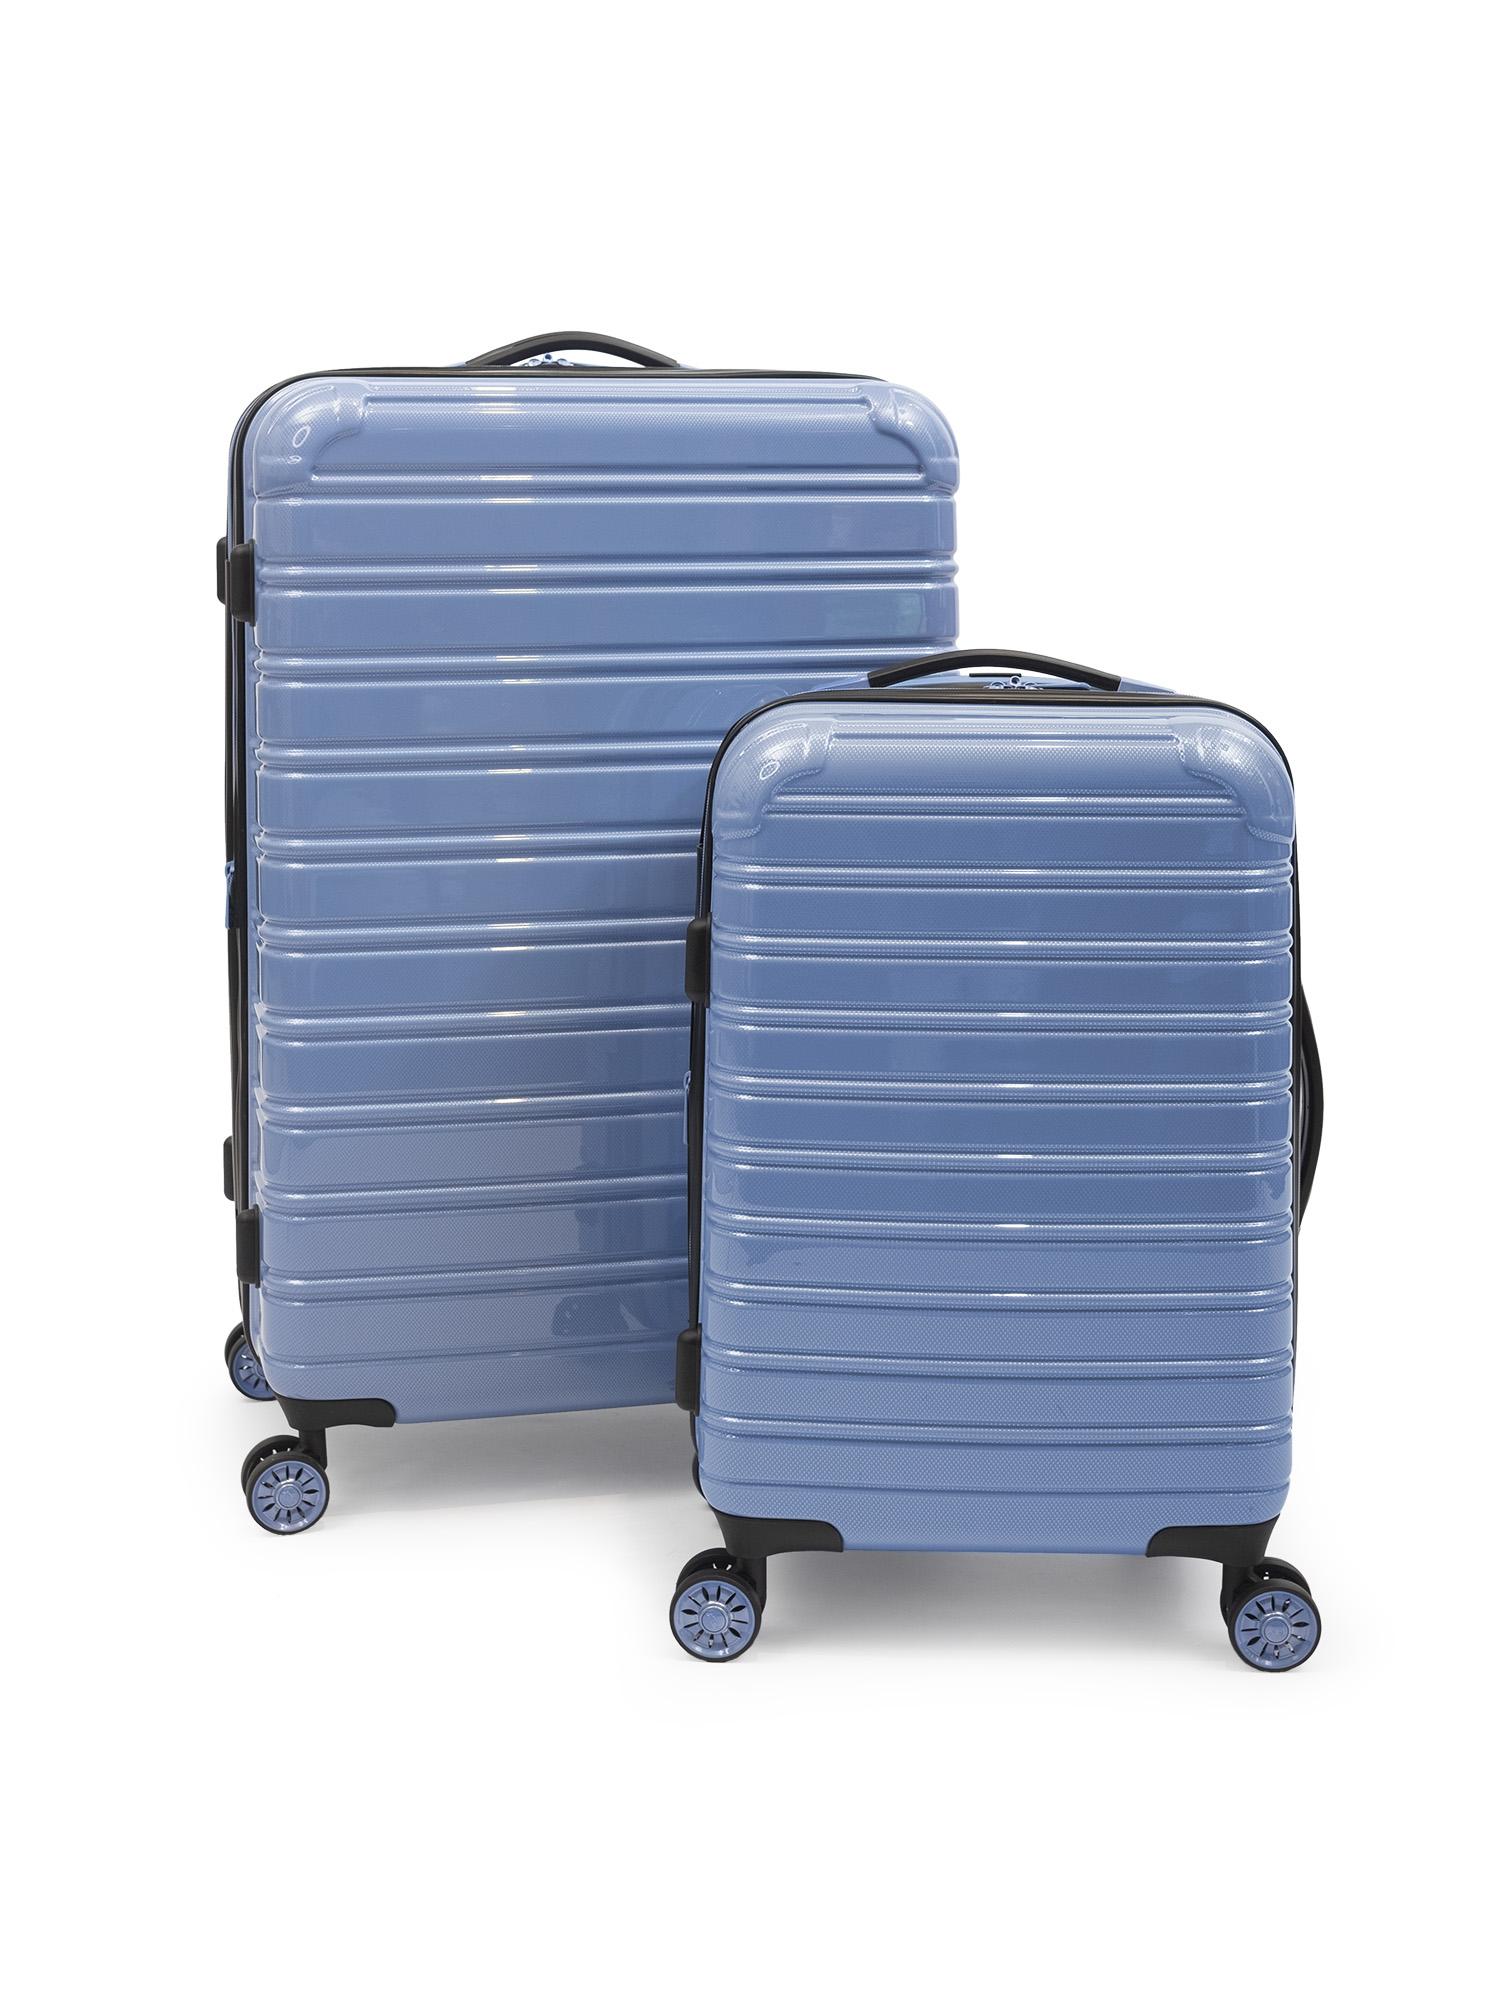 iFLY Hardside Fibertech Luggage, 2 Piece Set